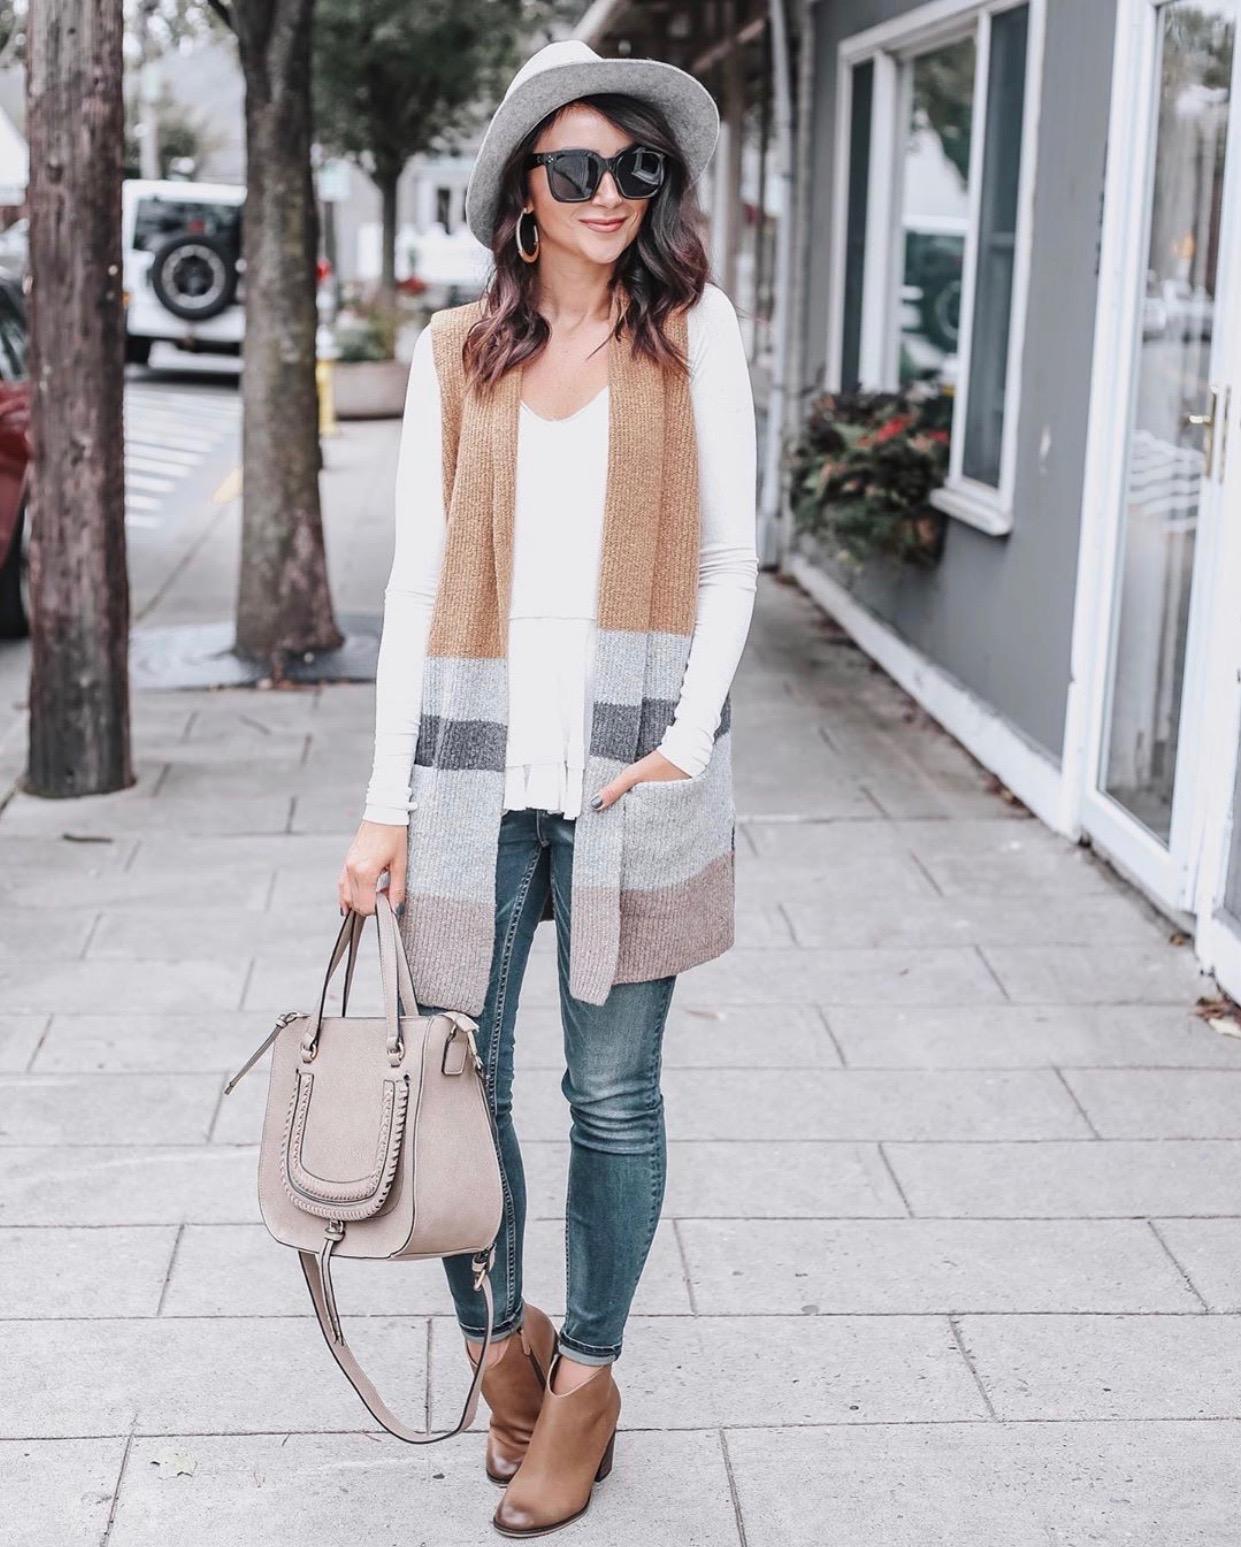 Colorblock sweater vest, Fall Outfit Idea, Jeans